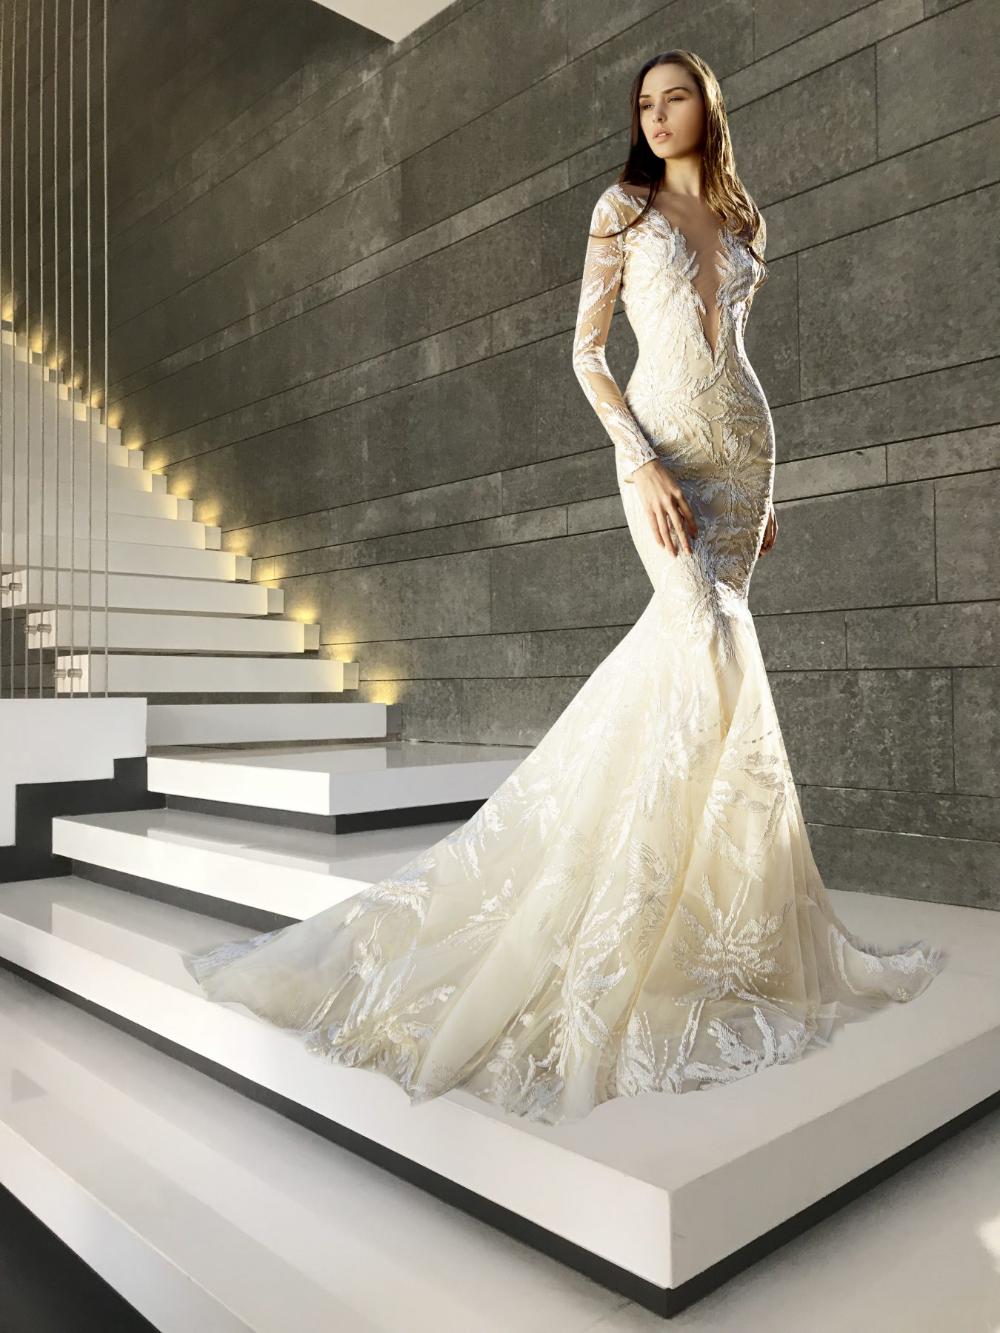 Long Sleeve Deep V Neck Embroidery Detailed Mermaid Wedding Dress Kleinfeld Long Sleeve Mermaid Wedding Dress Wedding Dresses Kleinfeld Wedding Dresses Lace [ 1333 x 1000 Pixel ]